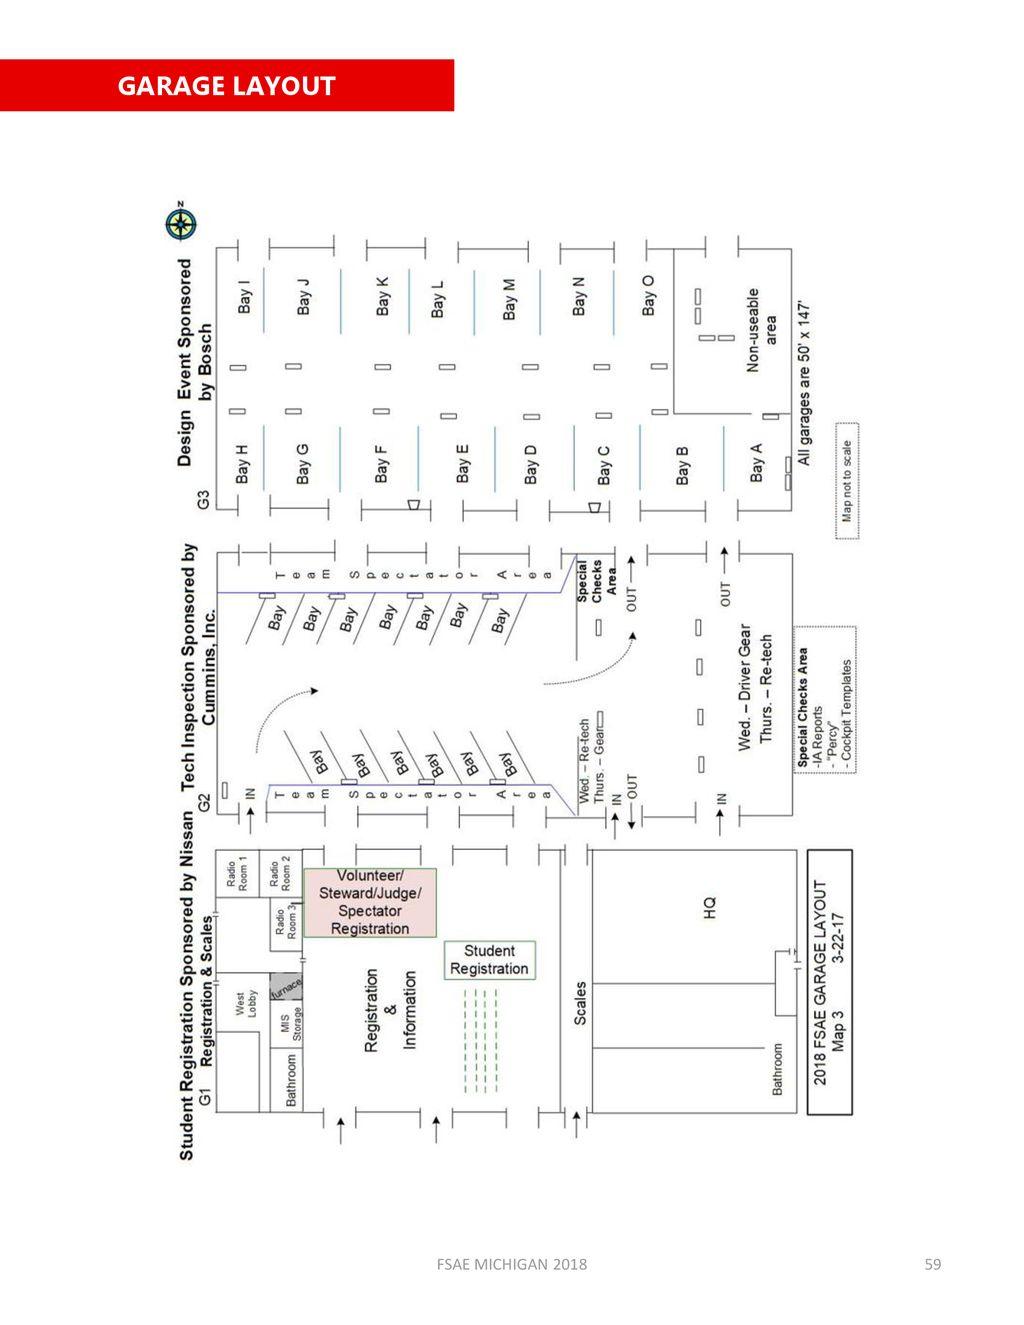 Formula Sae Michigan Brooklyn May Ppt Download 1999 Chrysler T 038 C Limited 38 Digital Transmission Fuse Box Diagram 59 Garage Layout Fsae 2018